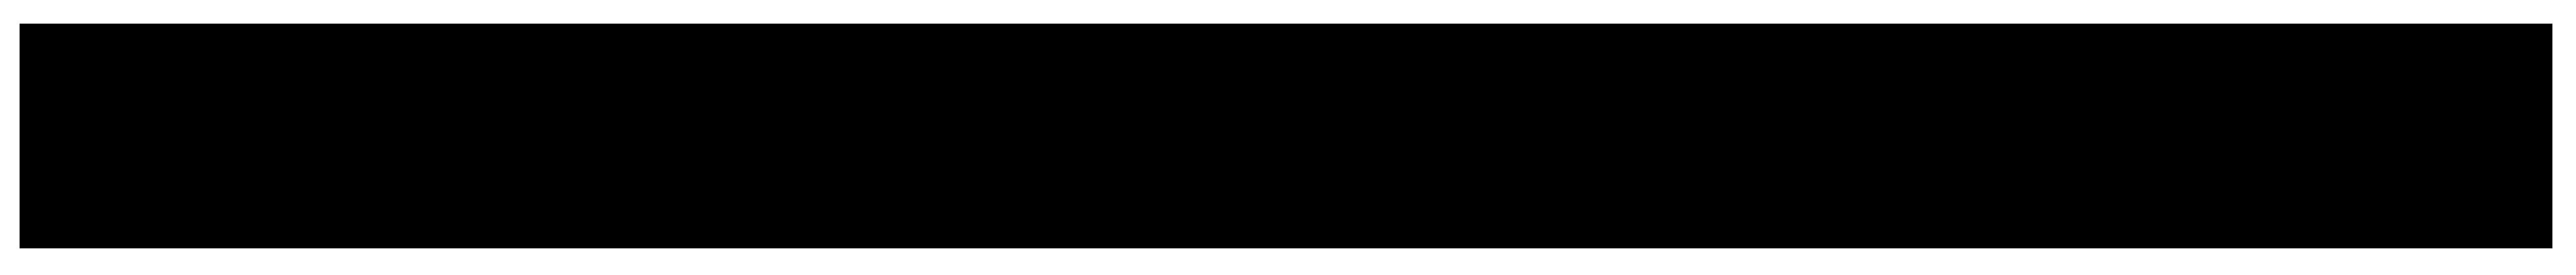 TAPIA FIGUEIRAS